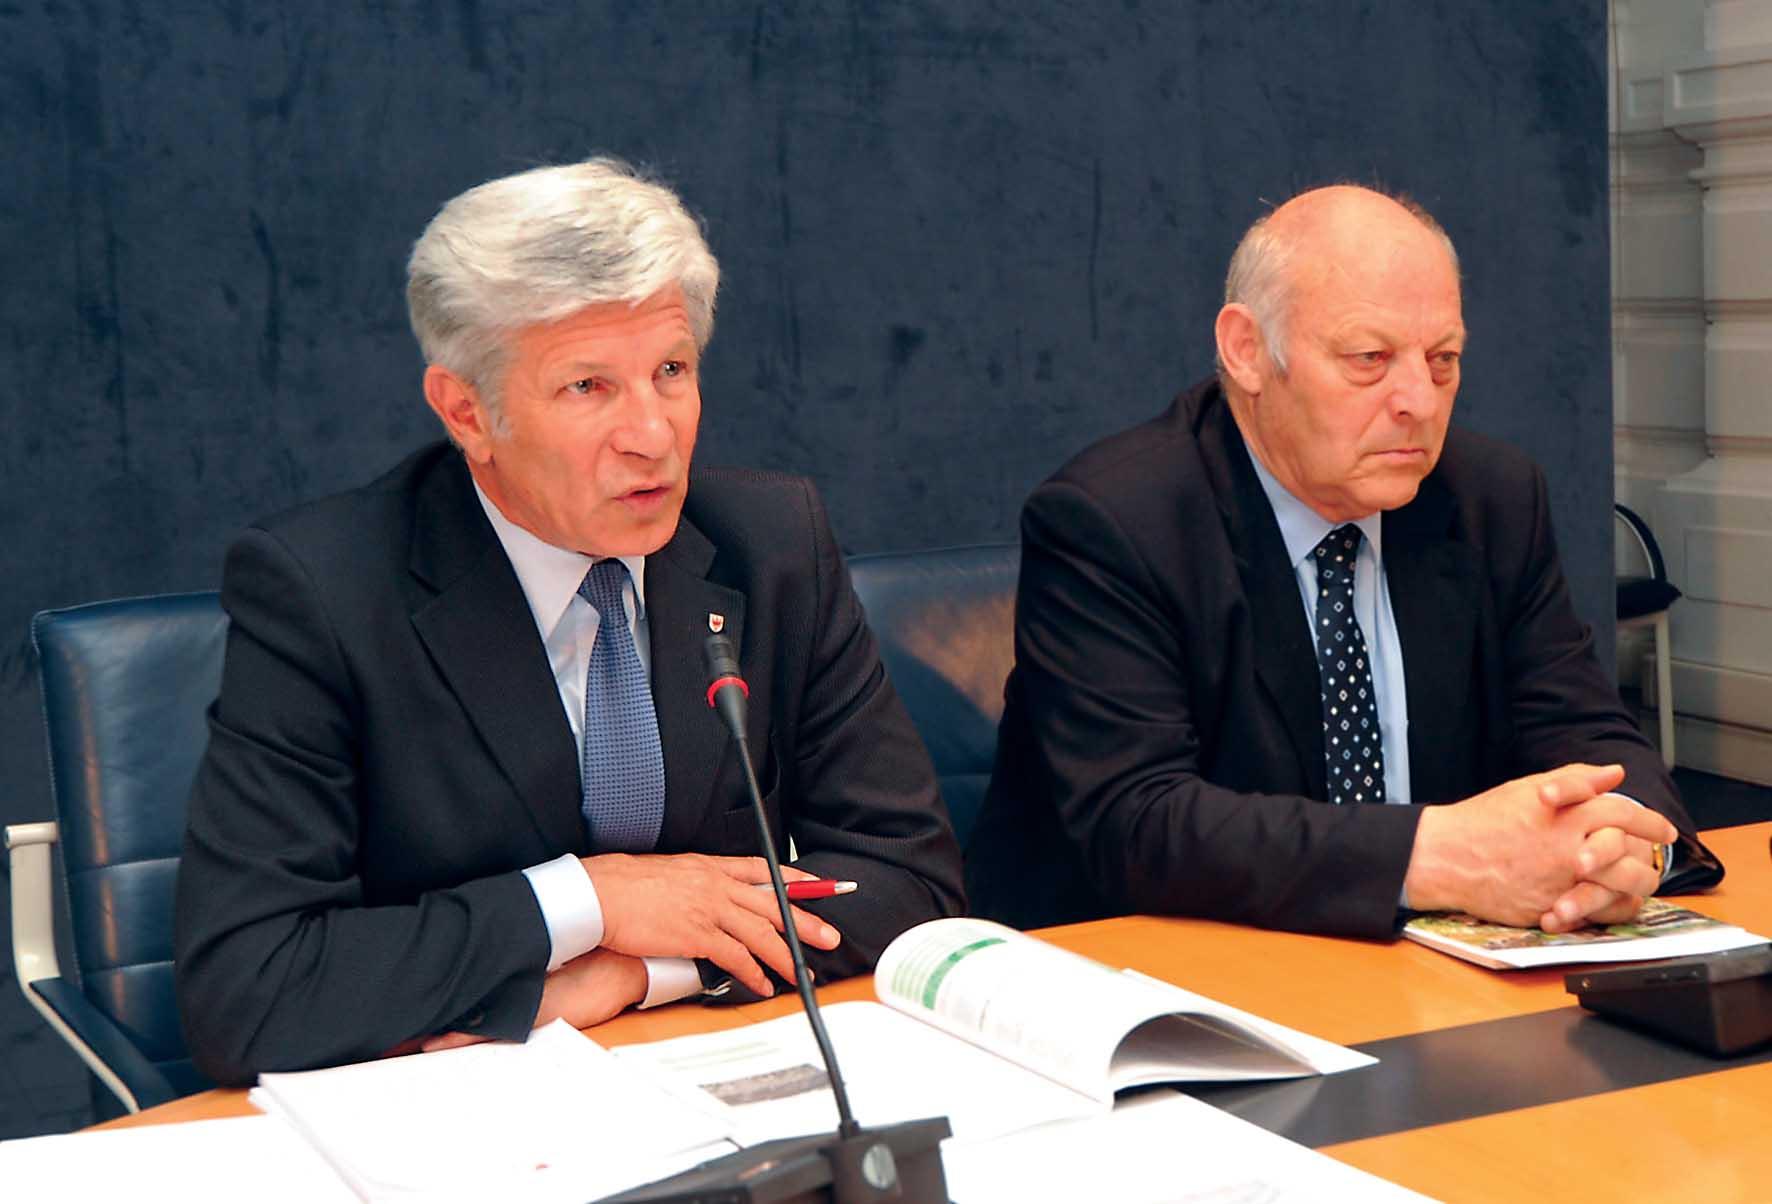 PAB Hans Berger Luis Durnwalder